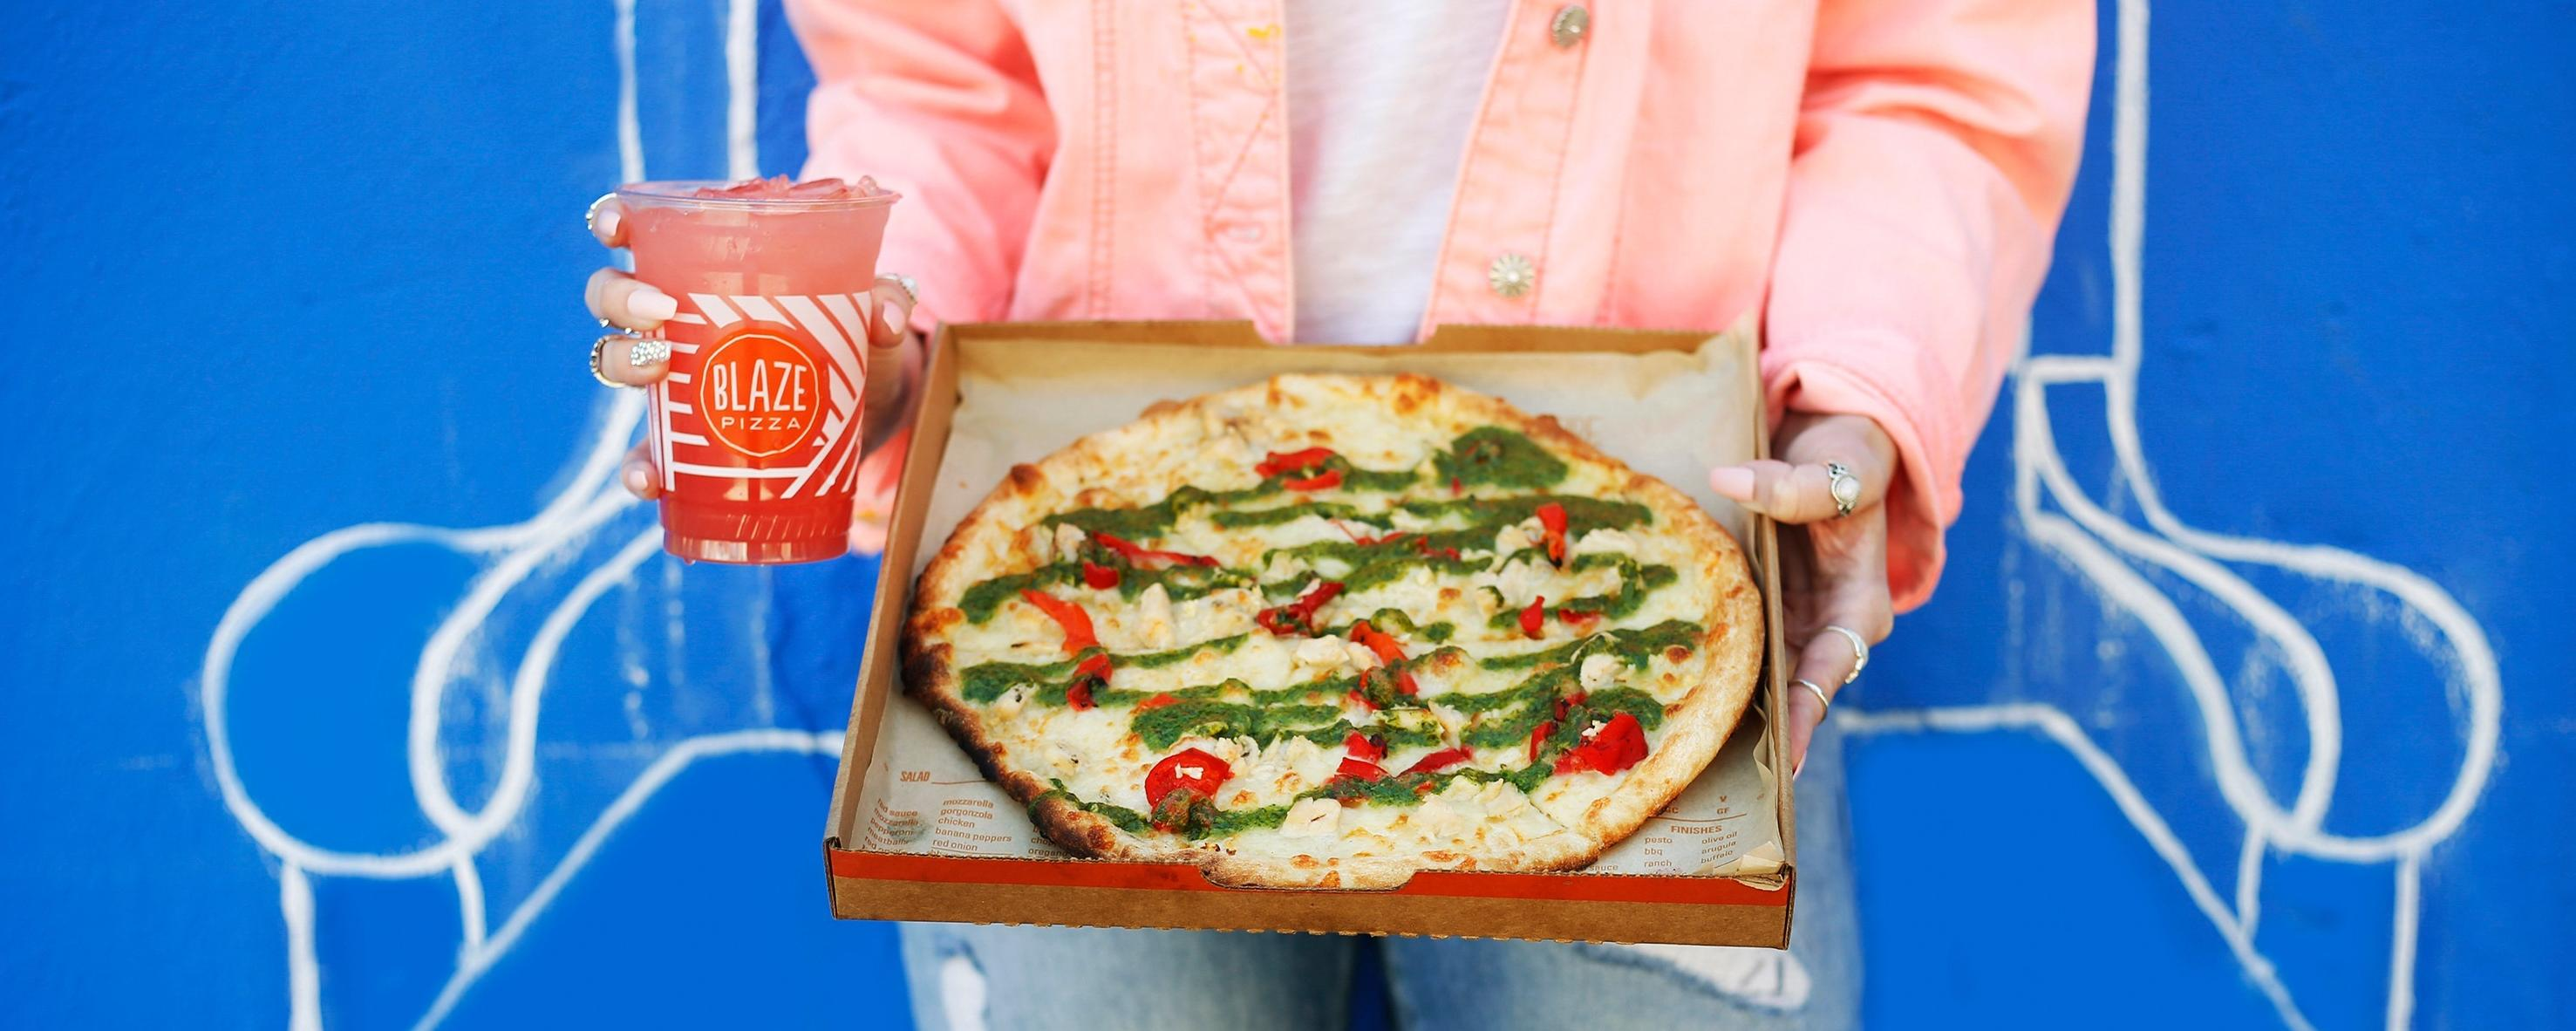 Blaze Pizza - Fort Lauderdale Brand Cover